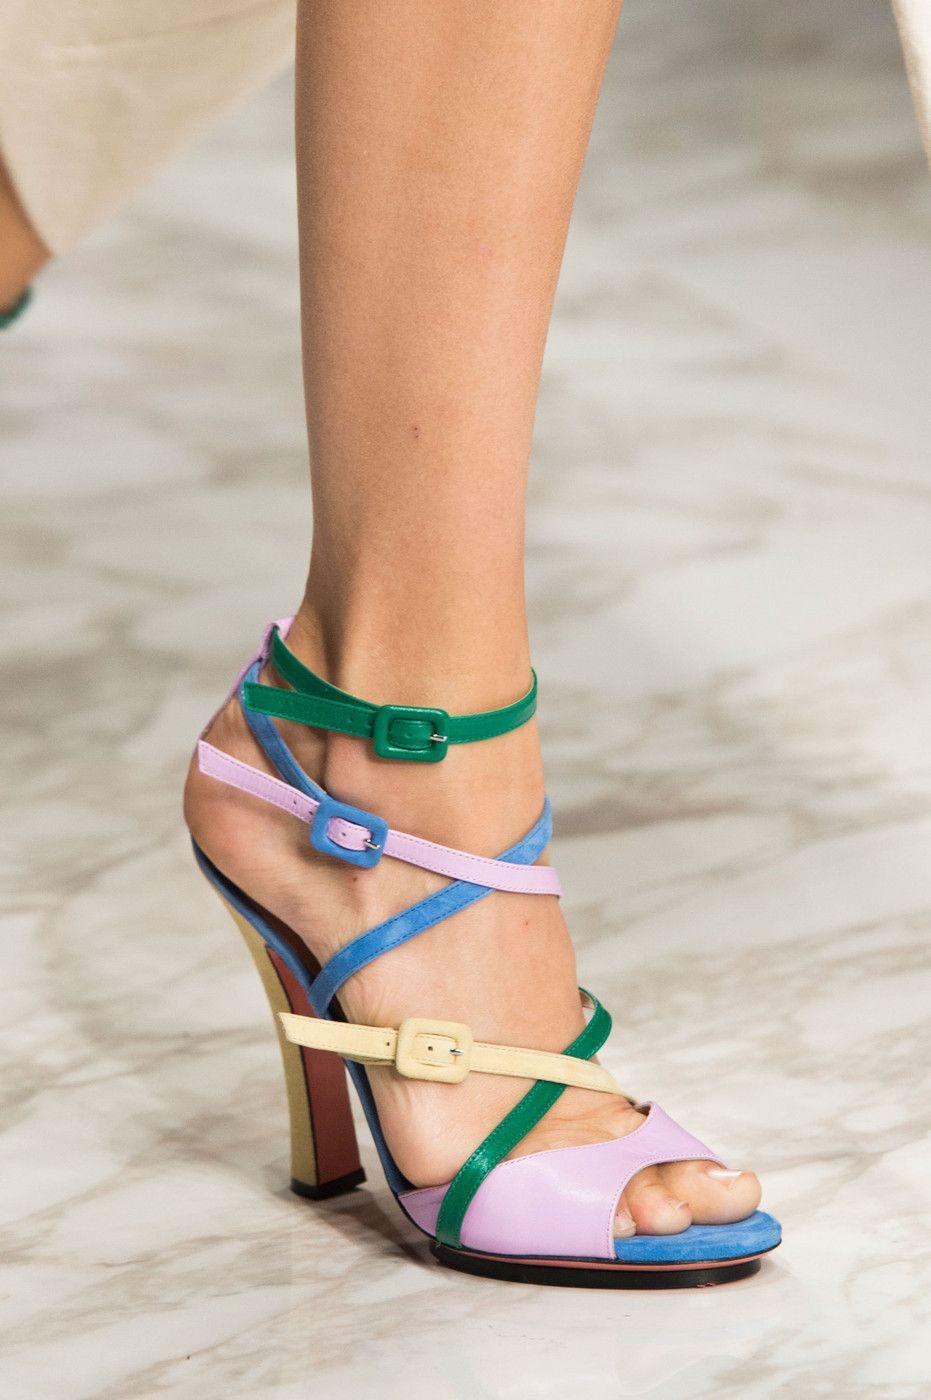 33148f4eebaf74 Blumarine at Milan Spring 2016 (Details). Phyle Style  Shoes Fashion  Gladiator ...